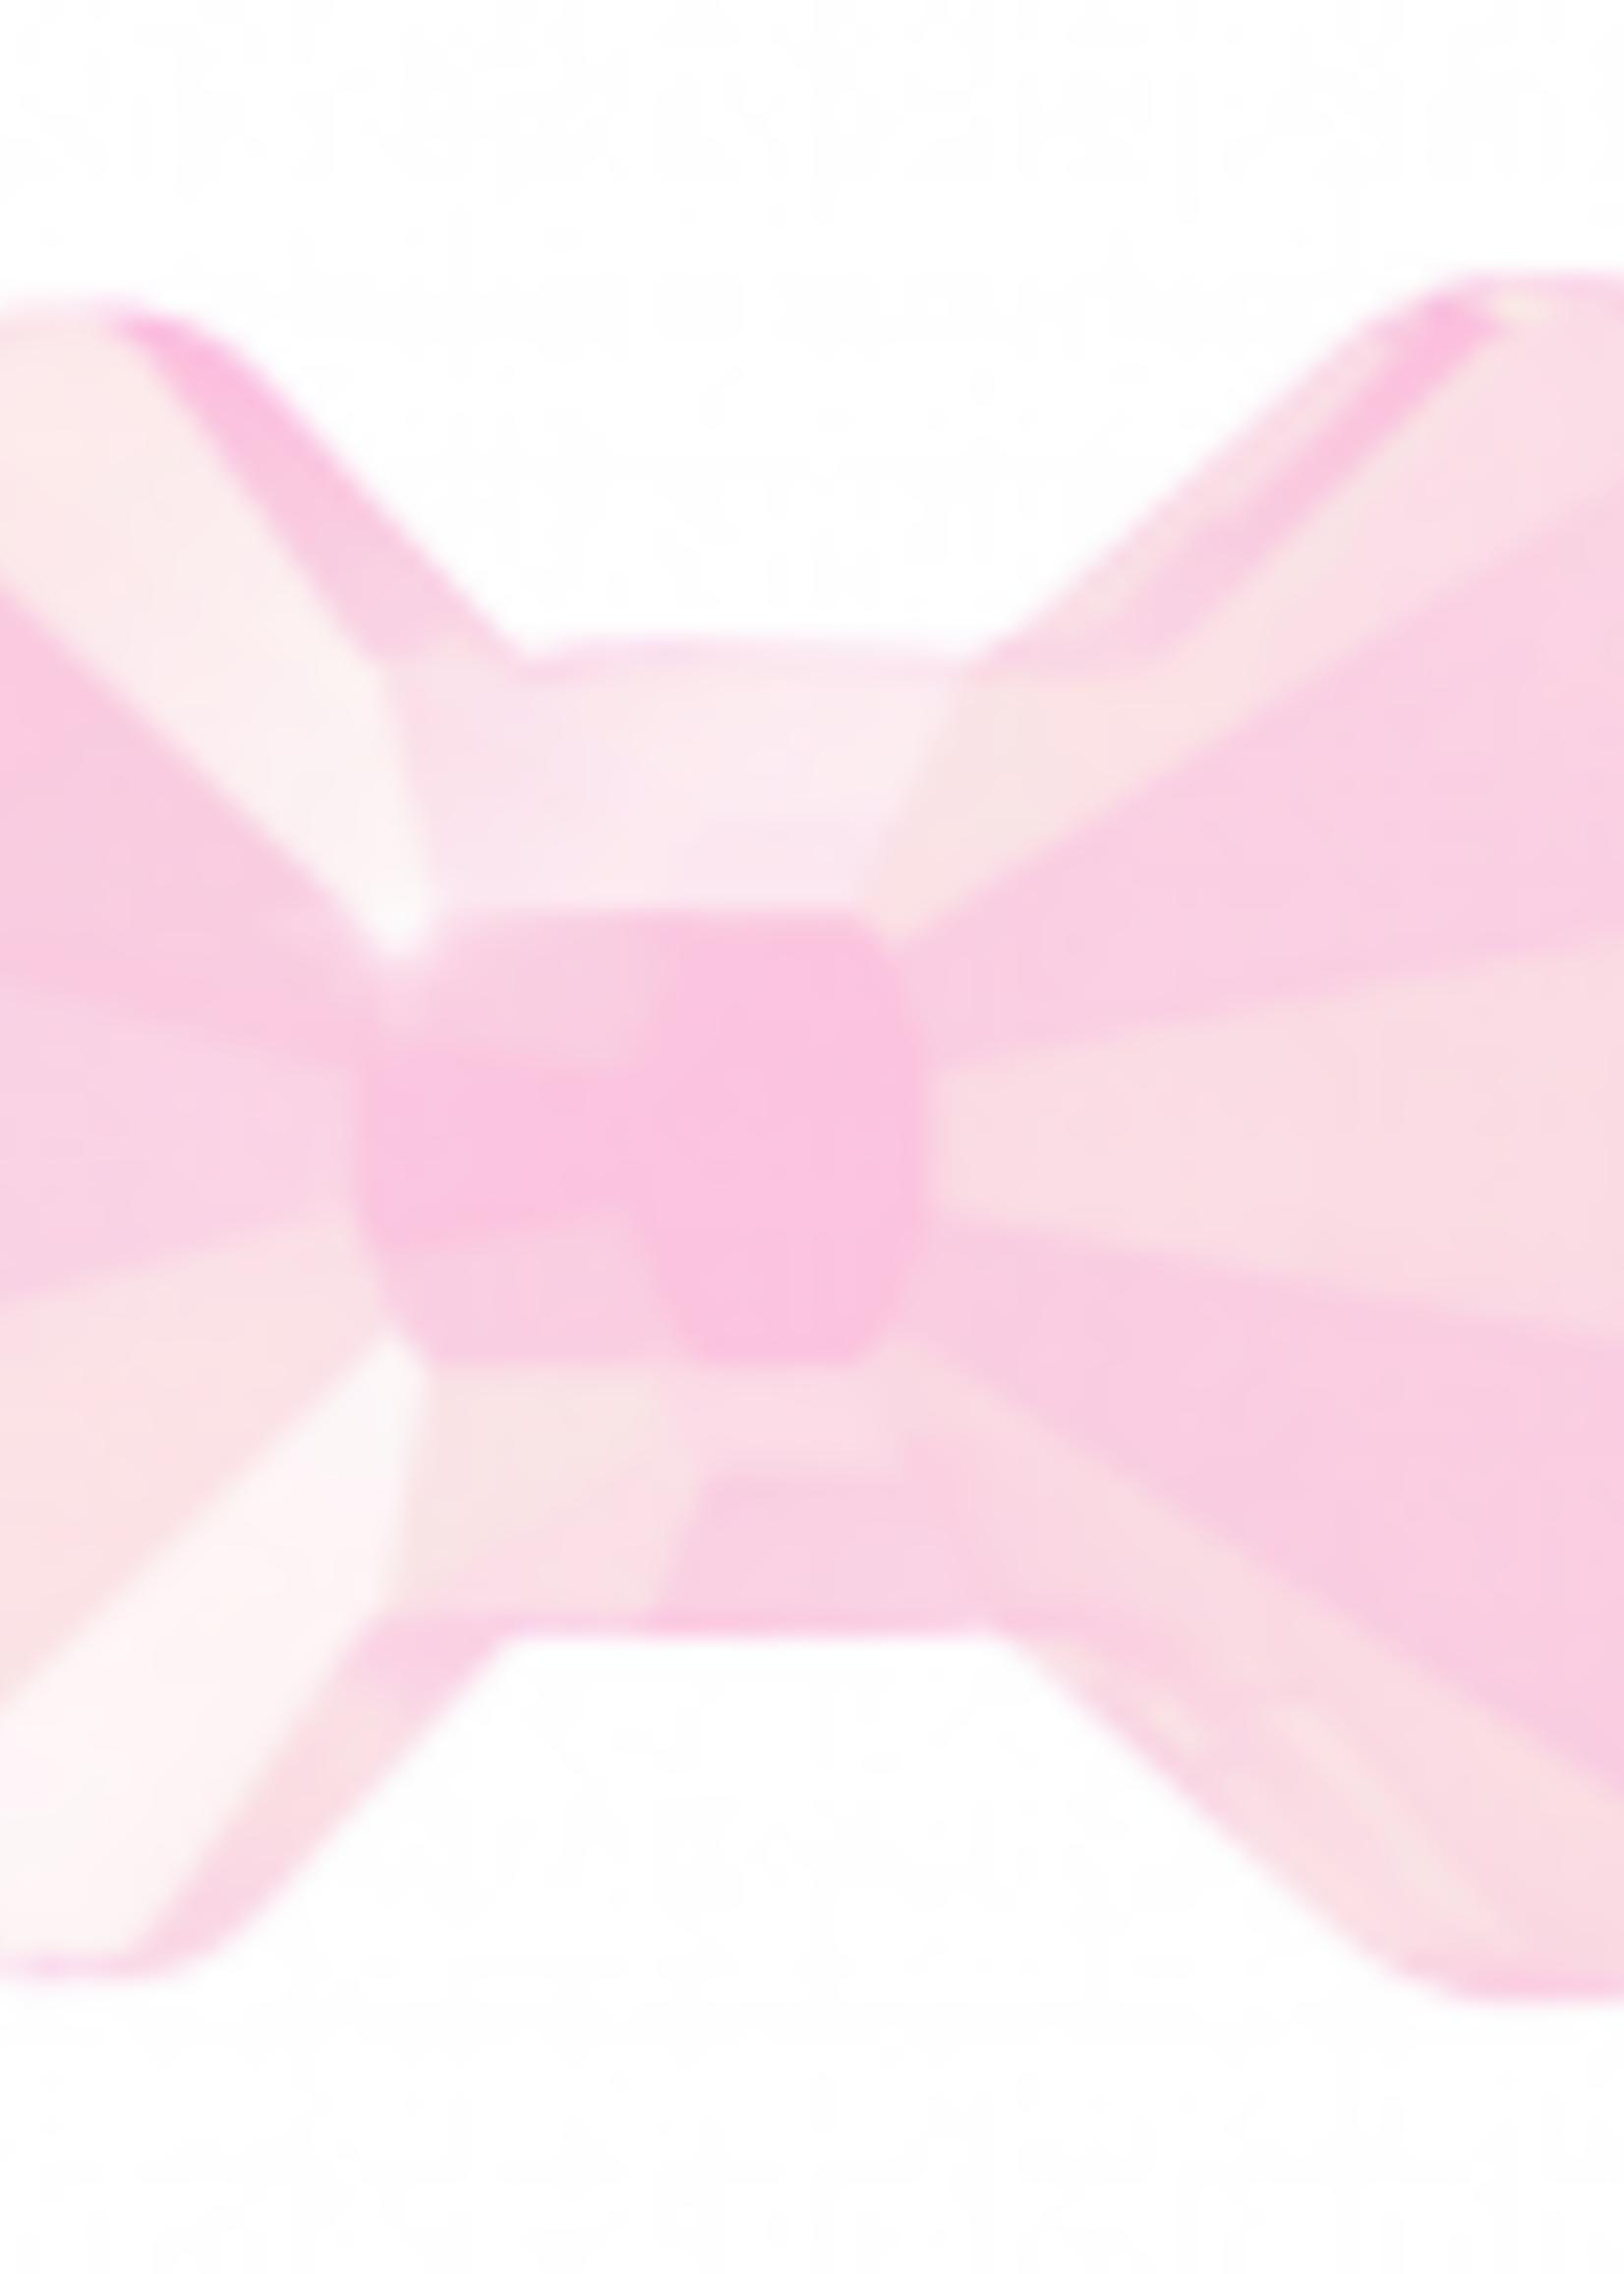 Swarovski Swarovski Crystal Bow Tie Rose 6.0 x 4.5 mm